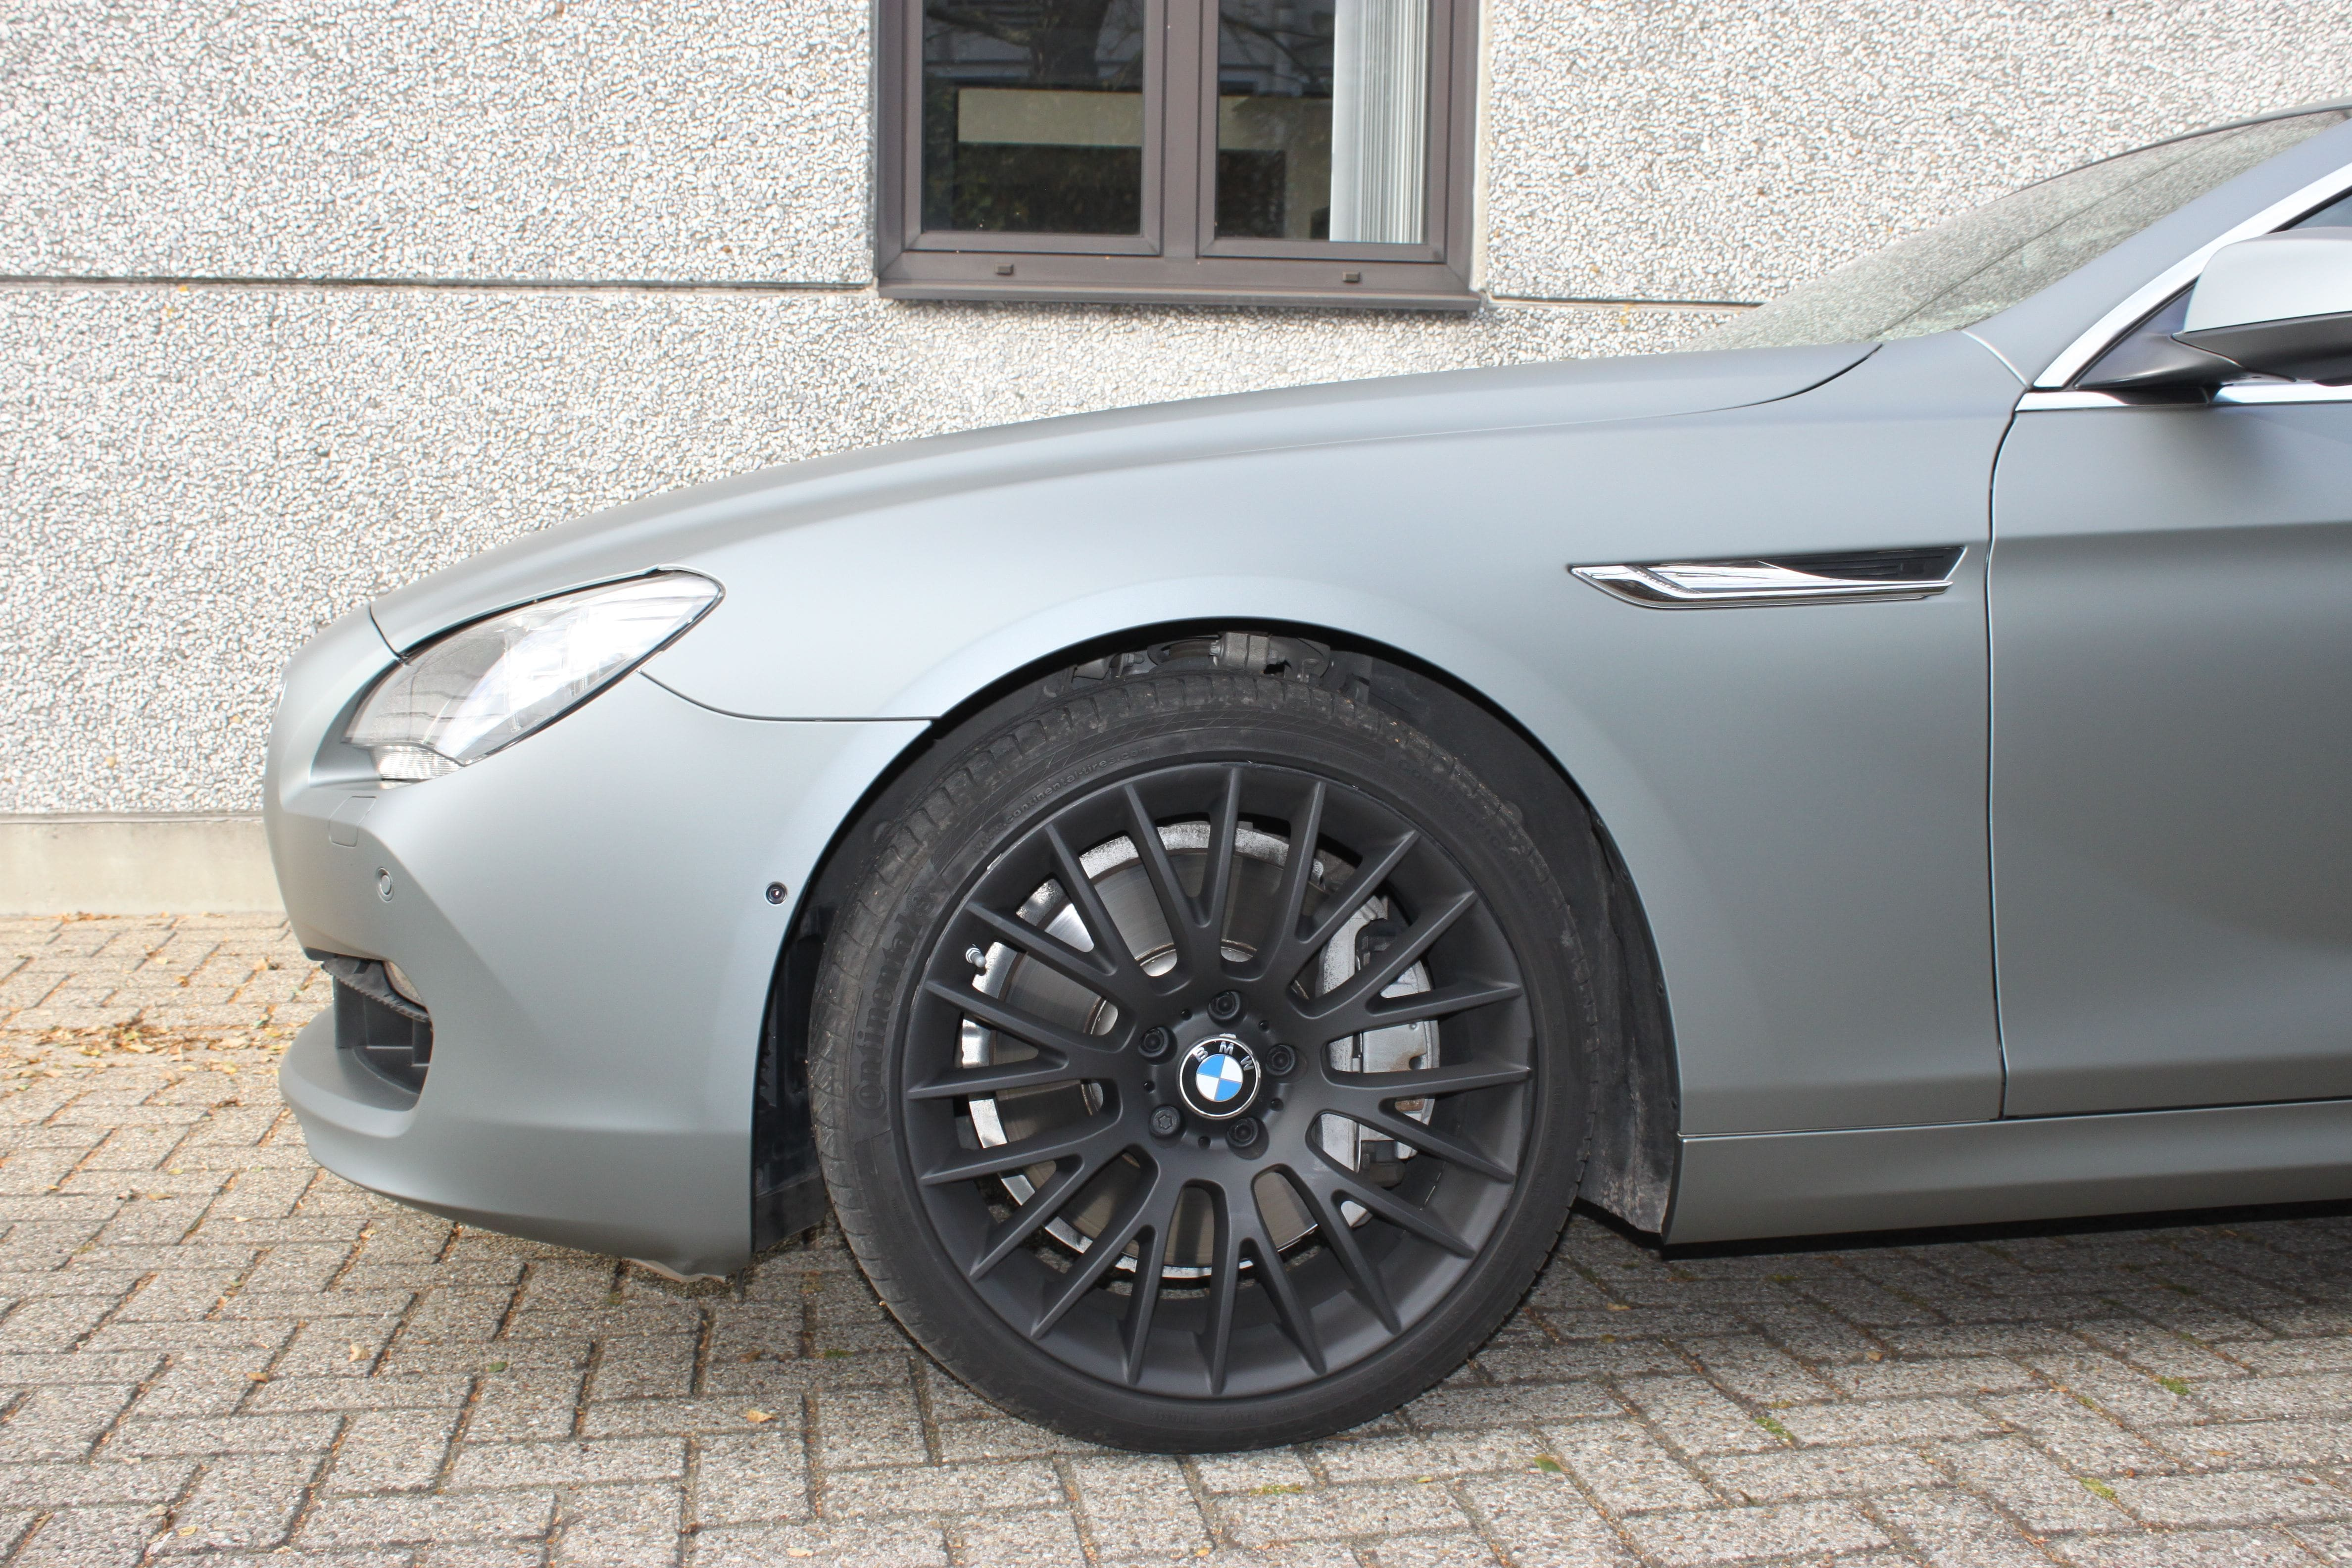 BMW 650i met Mat Antraciet Metallic Avery Wrap, Carwrapping door Wrapmyride.nu Foto-nr:5286, ©2020